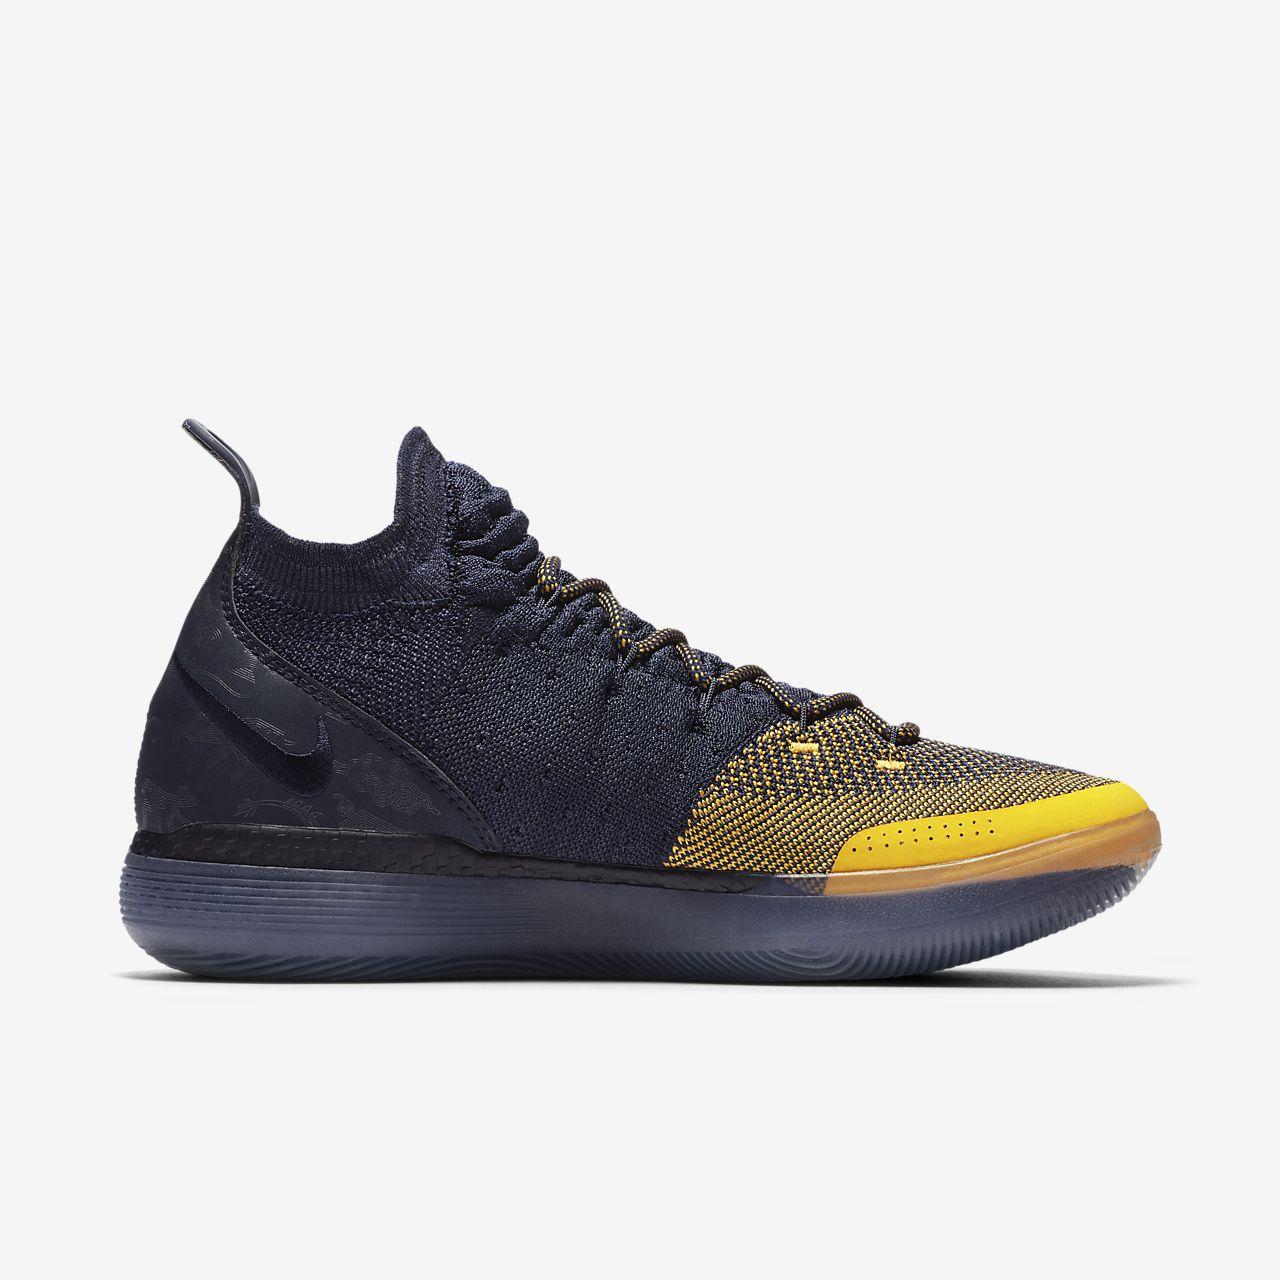 promo code 07db2 24ebe ... Chaussure de basketball Nike Zoom KD11